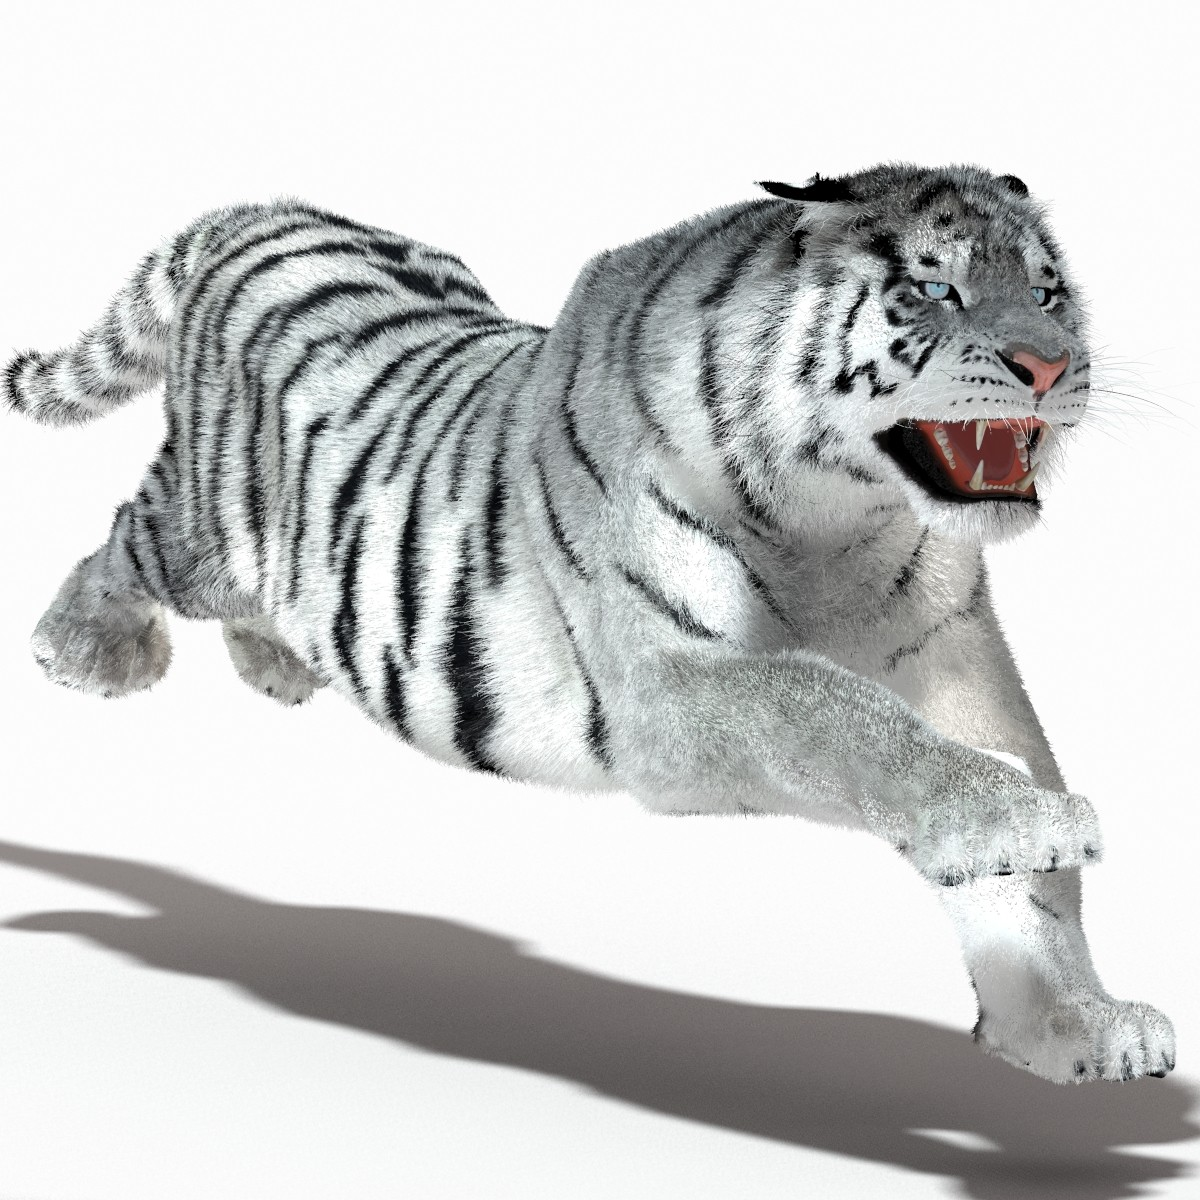 Tiger-White-01.jpg